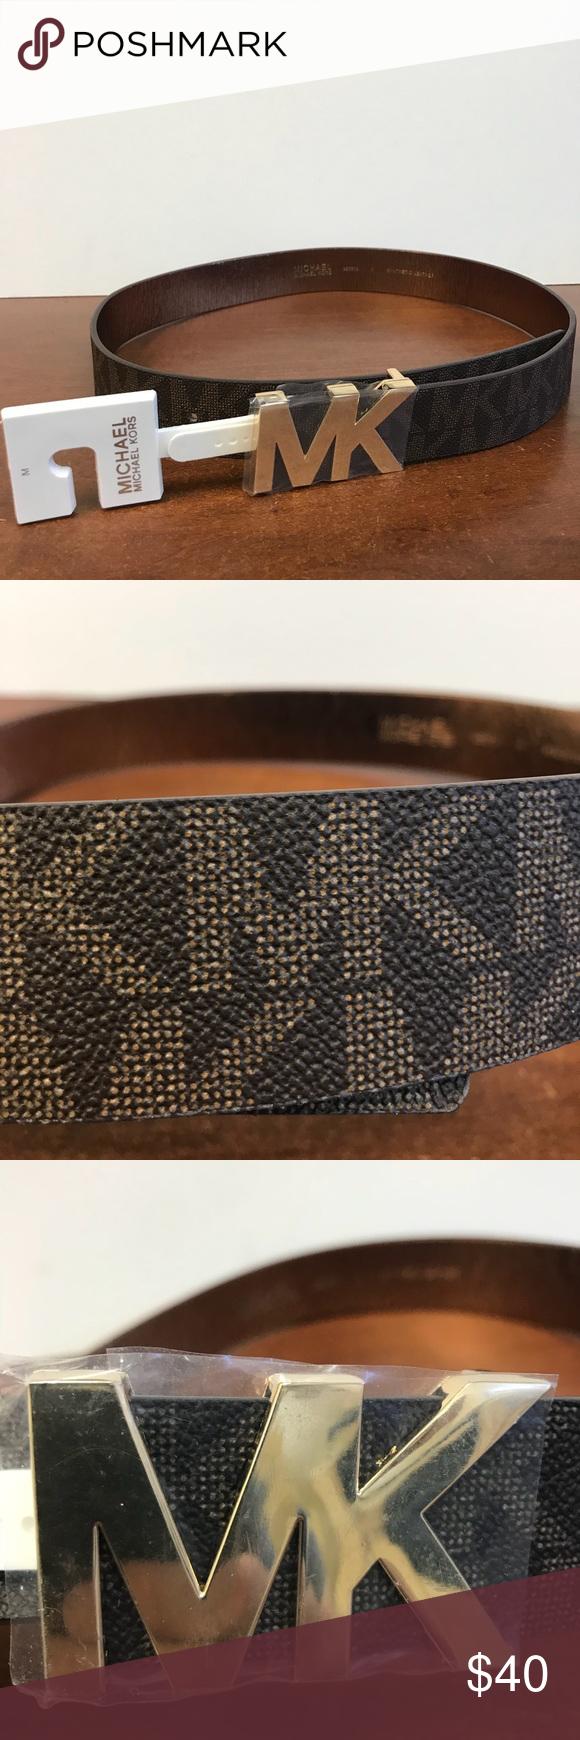 13bfdb0a0098 NWT Michael Kors MK Logo Belt. Women s Medium. NWT Michael Kors MK Logo  Synthetic Materials Belt. Women s Medium. MK 553376C Michael Kors  Accessories Belts